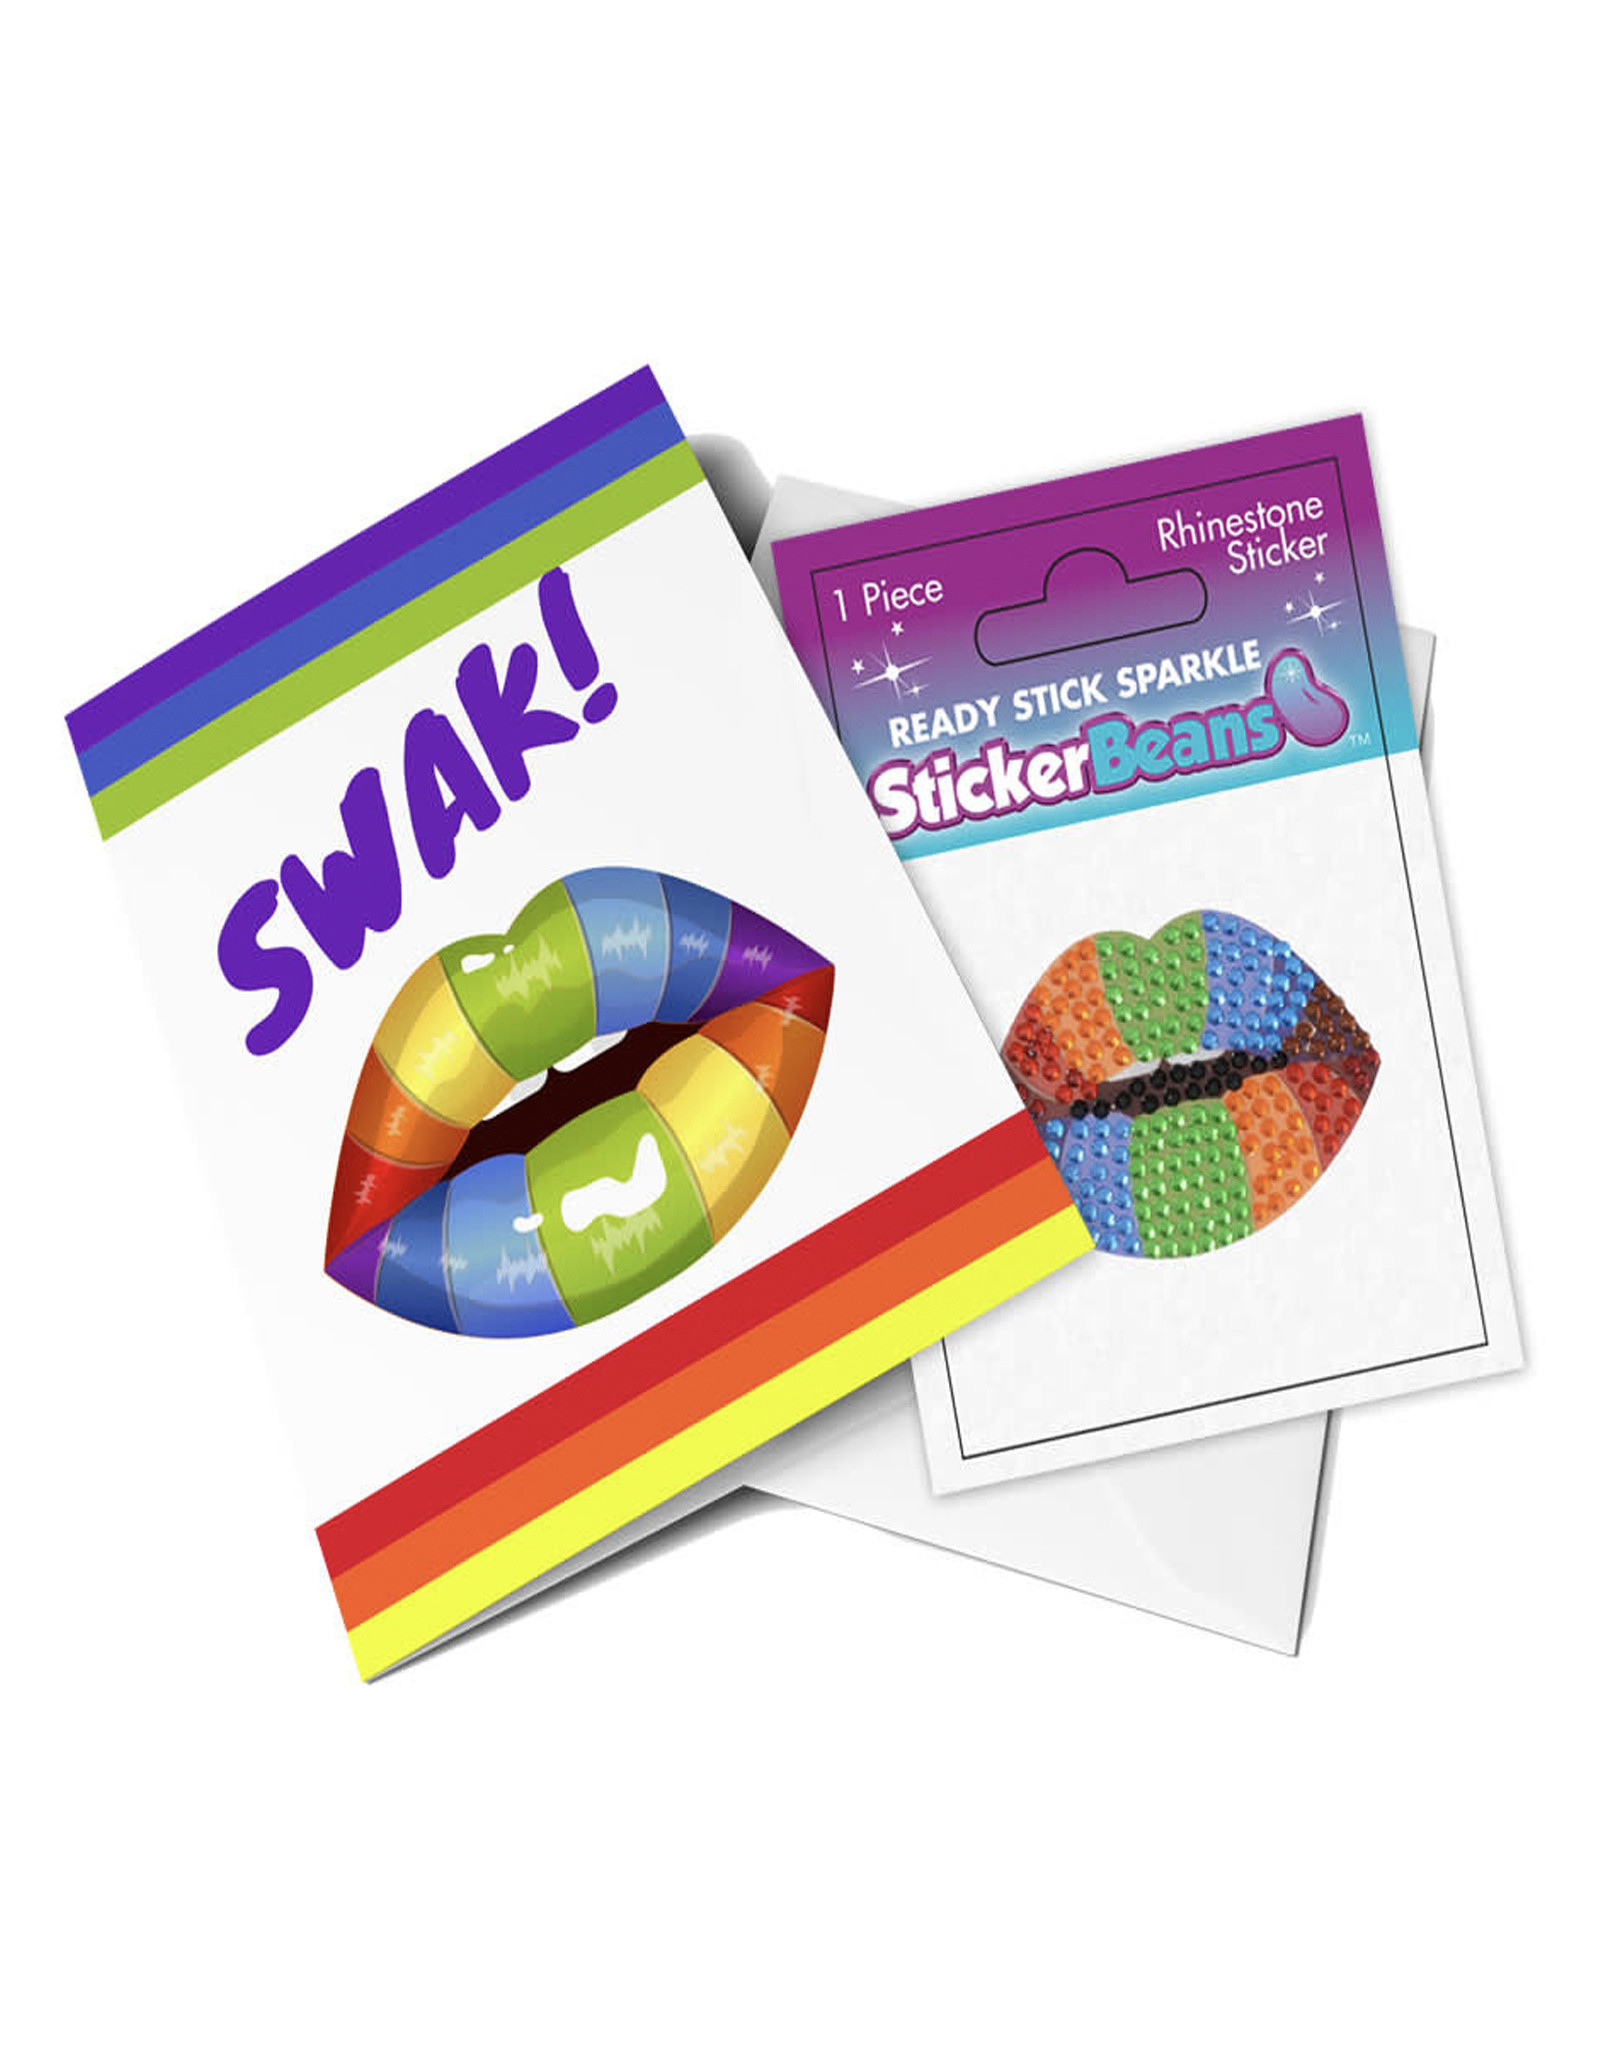 "Sticker Beans ""Swak"" Greeting Card w/ Sticker"